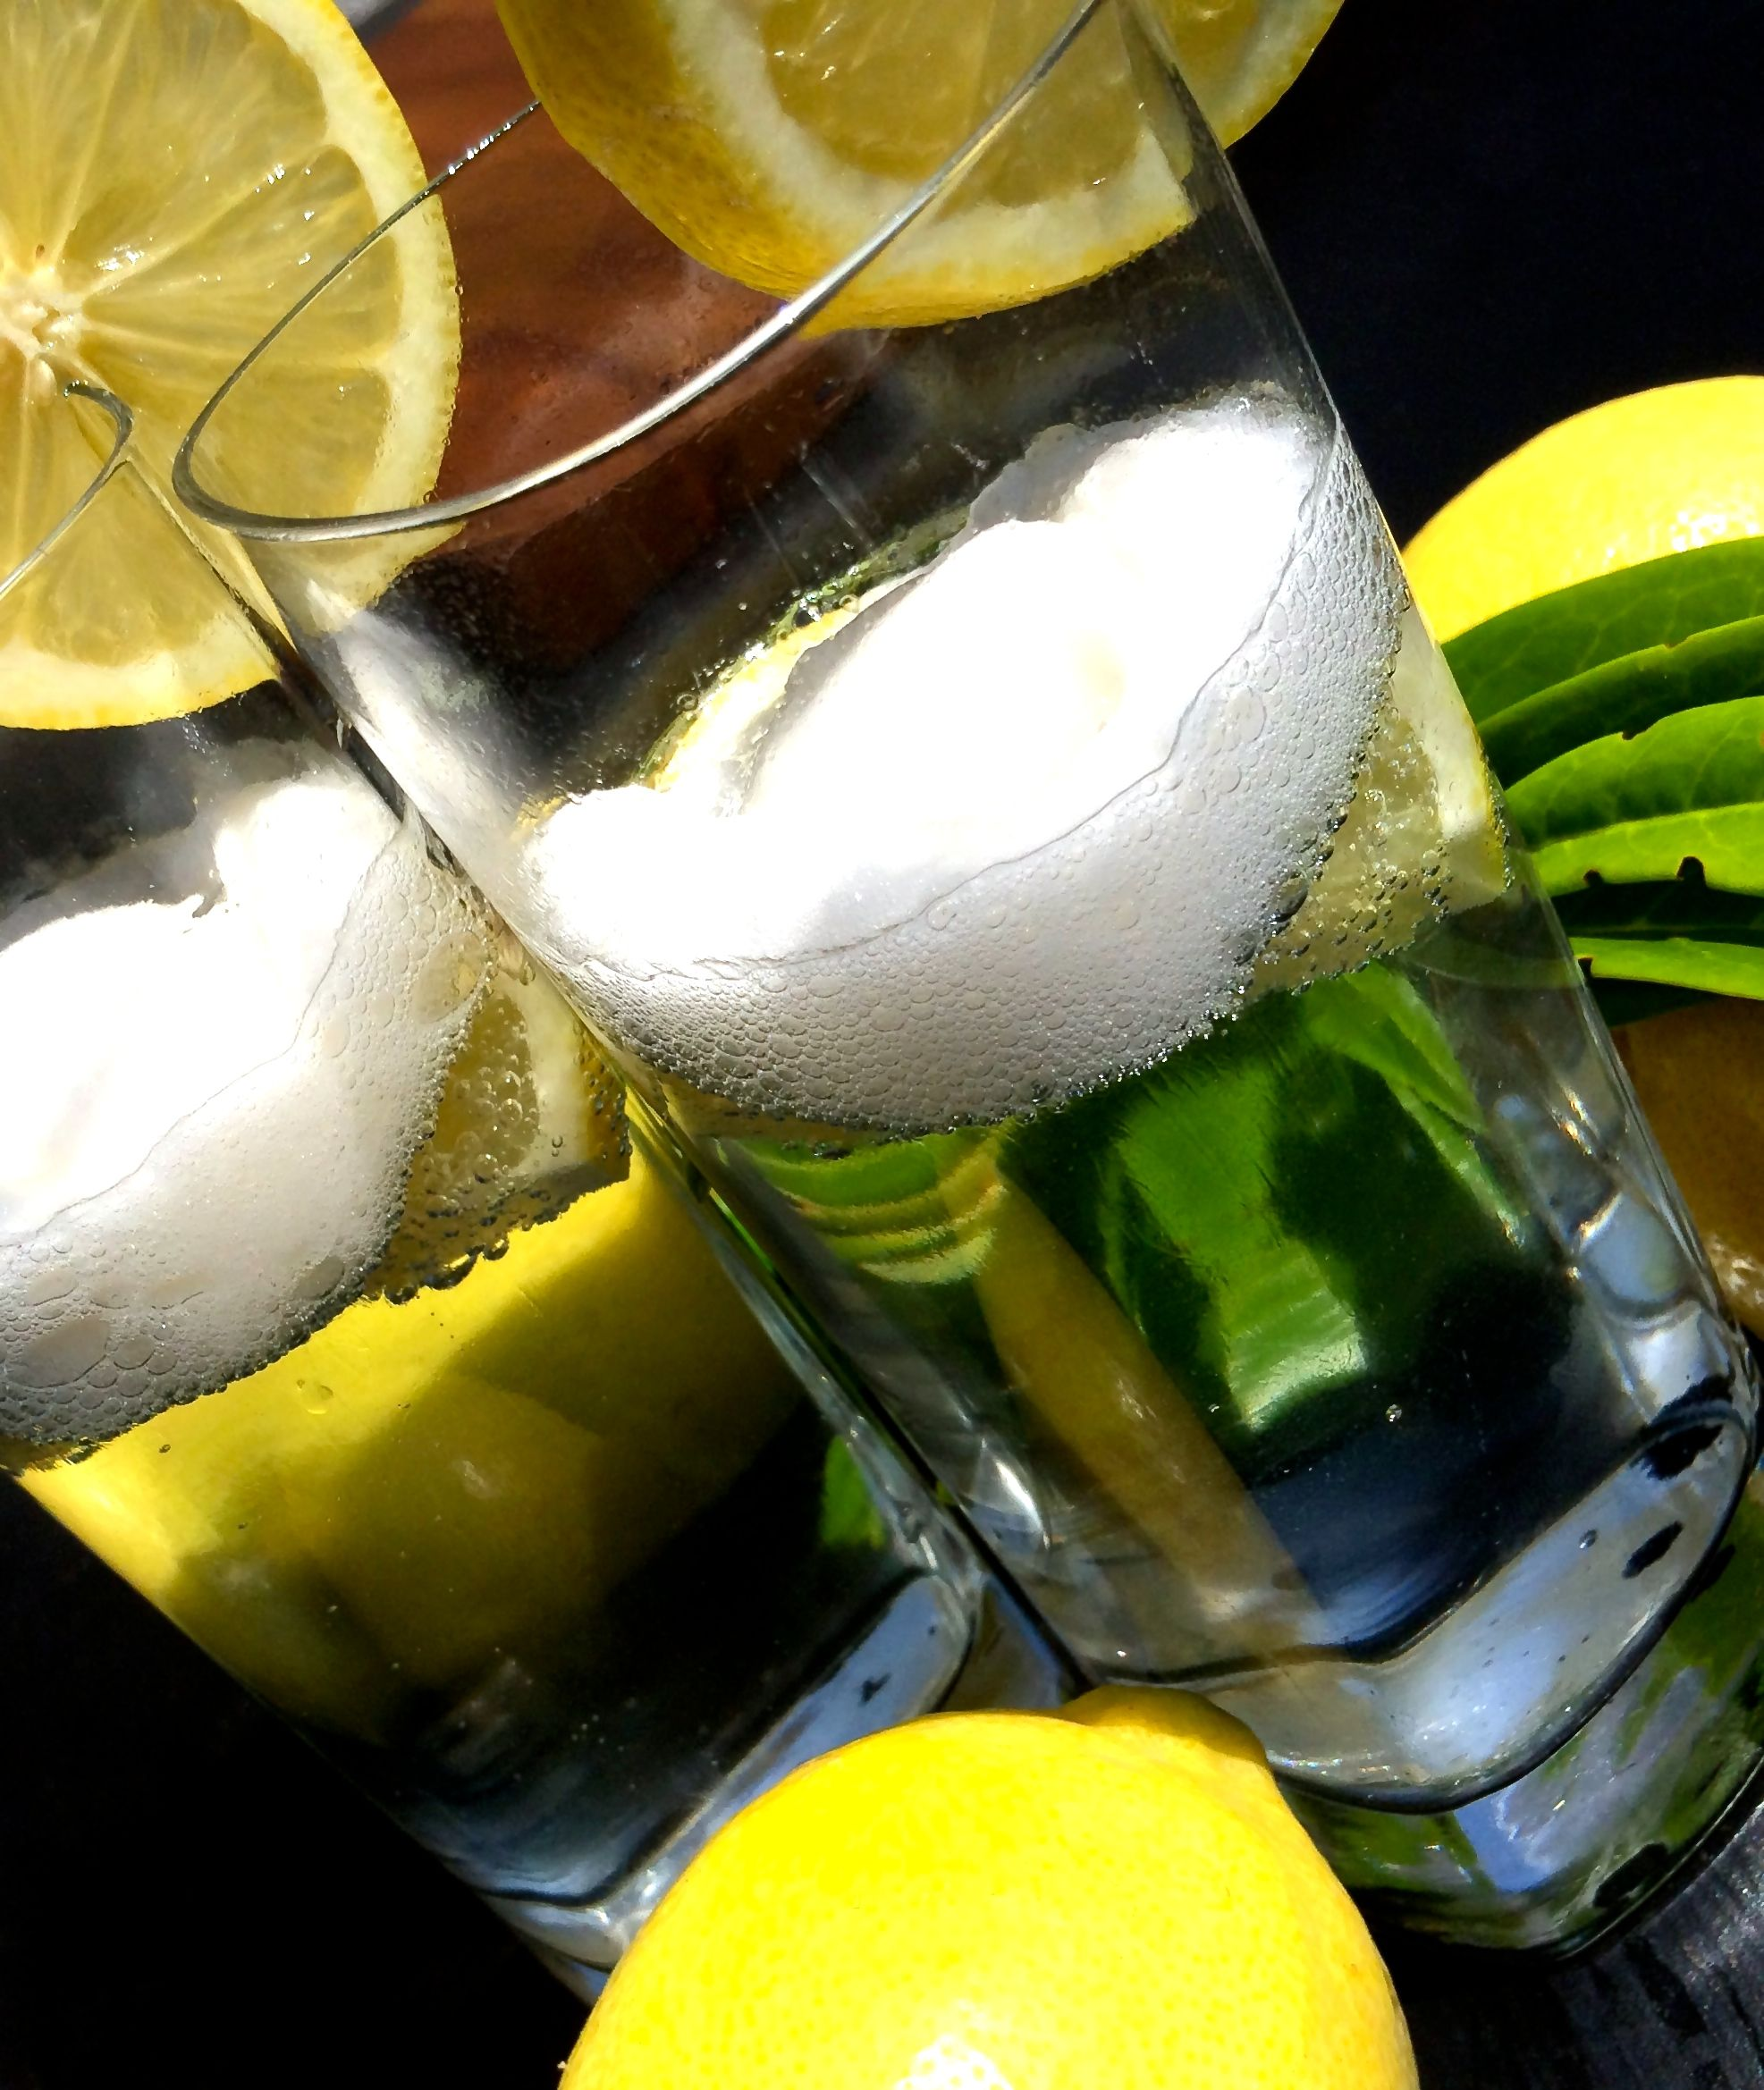 begrüßungsdrink ohne alkohol